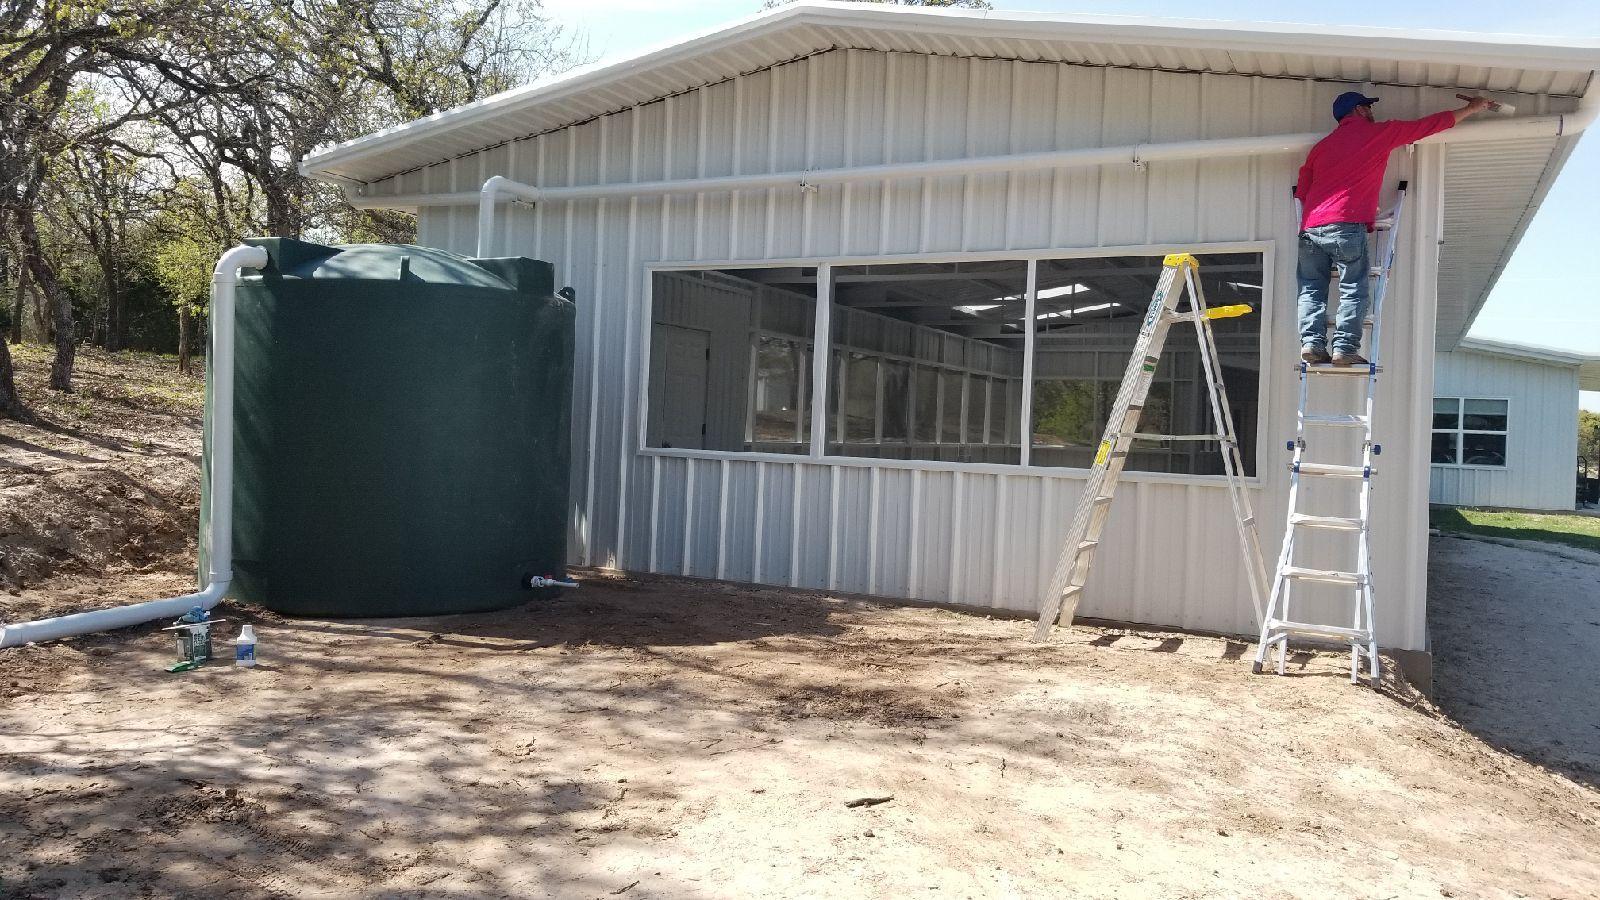 2500 Gallon Rain Collection System Rain Water Collection Diy Rain Water Collection Rainwater Harvesting